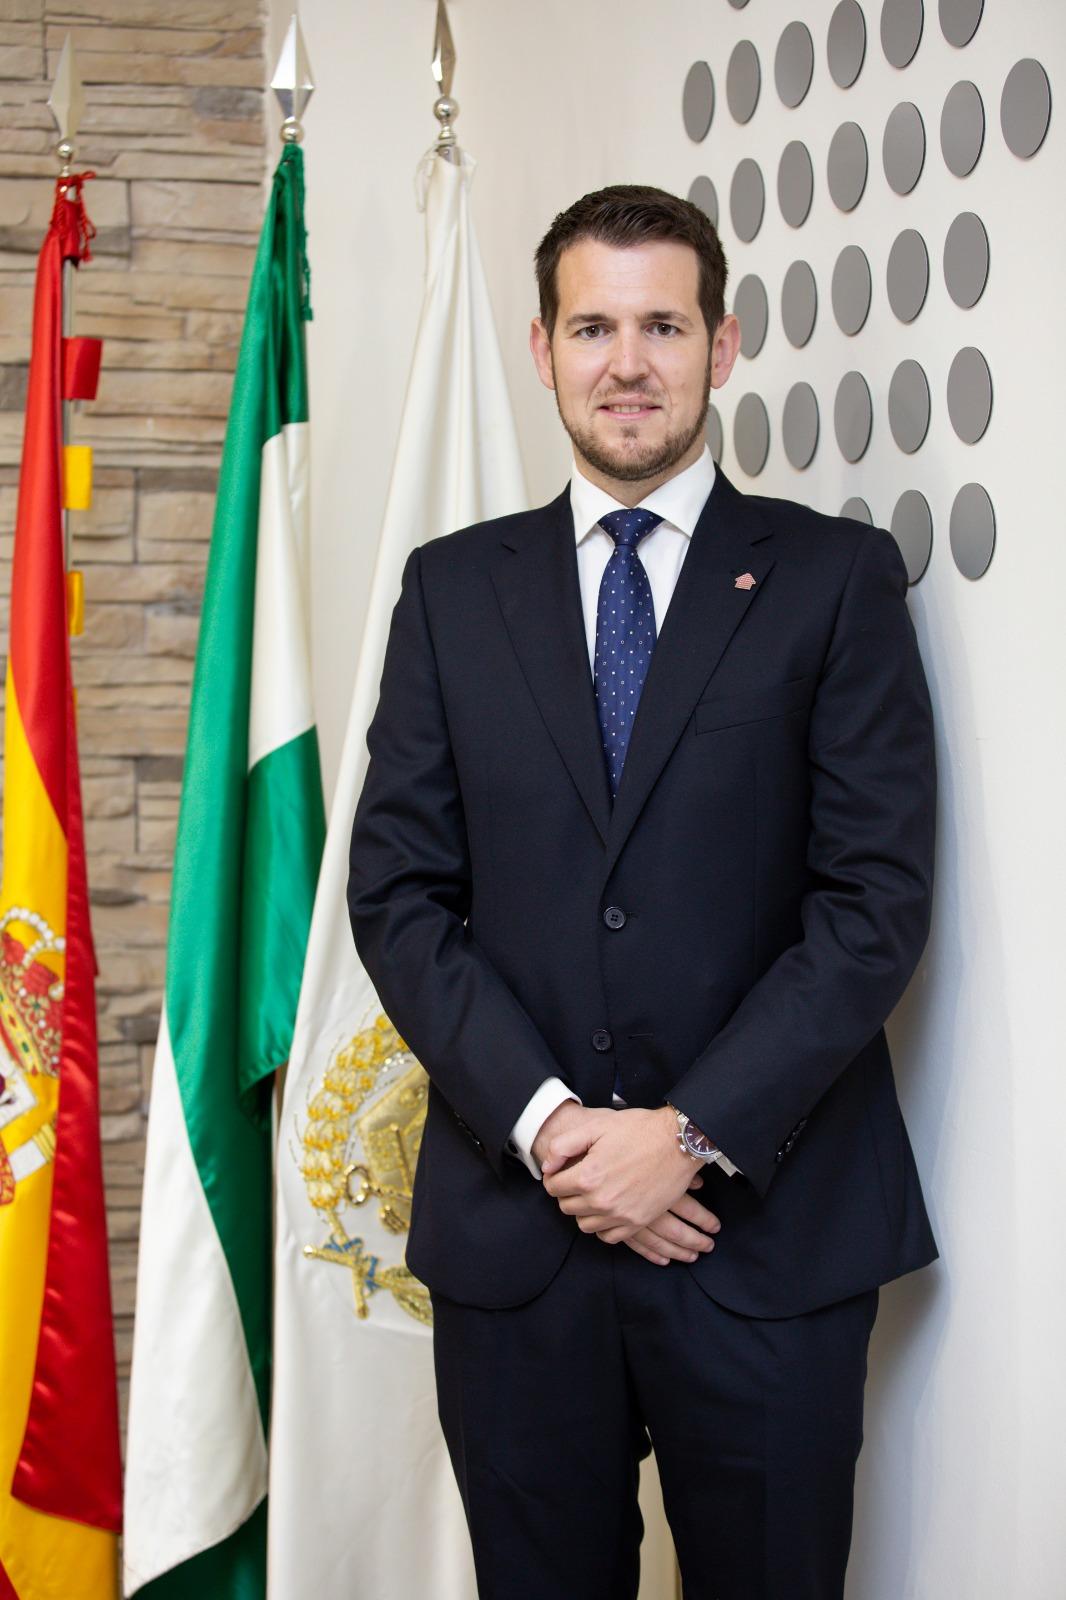 D. Sergio Gómez Gutiérrez